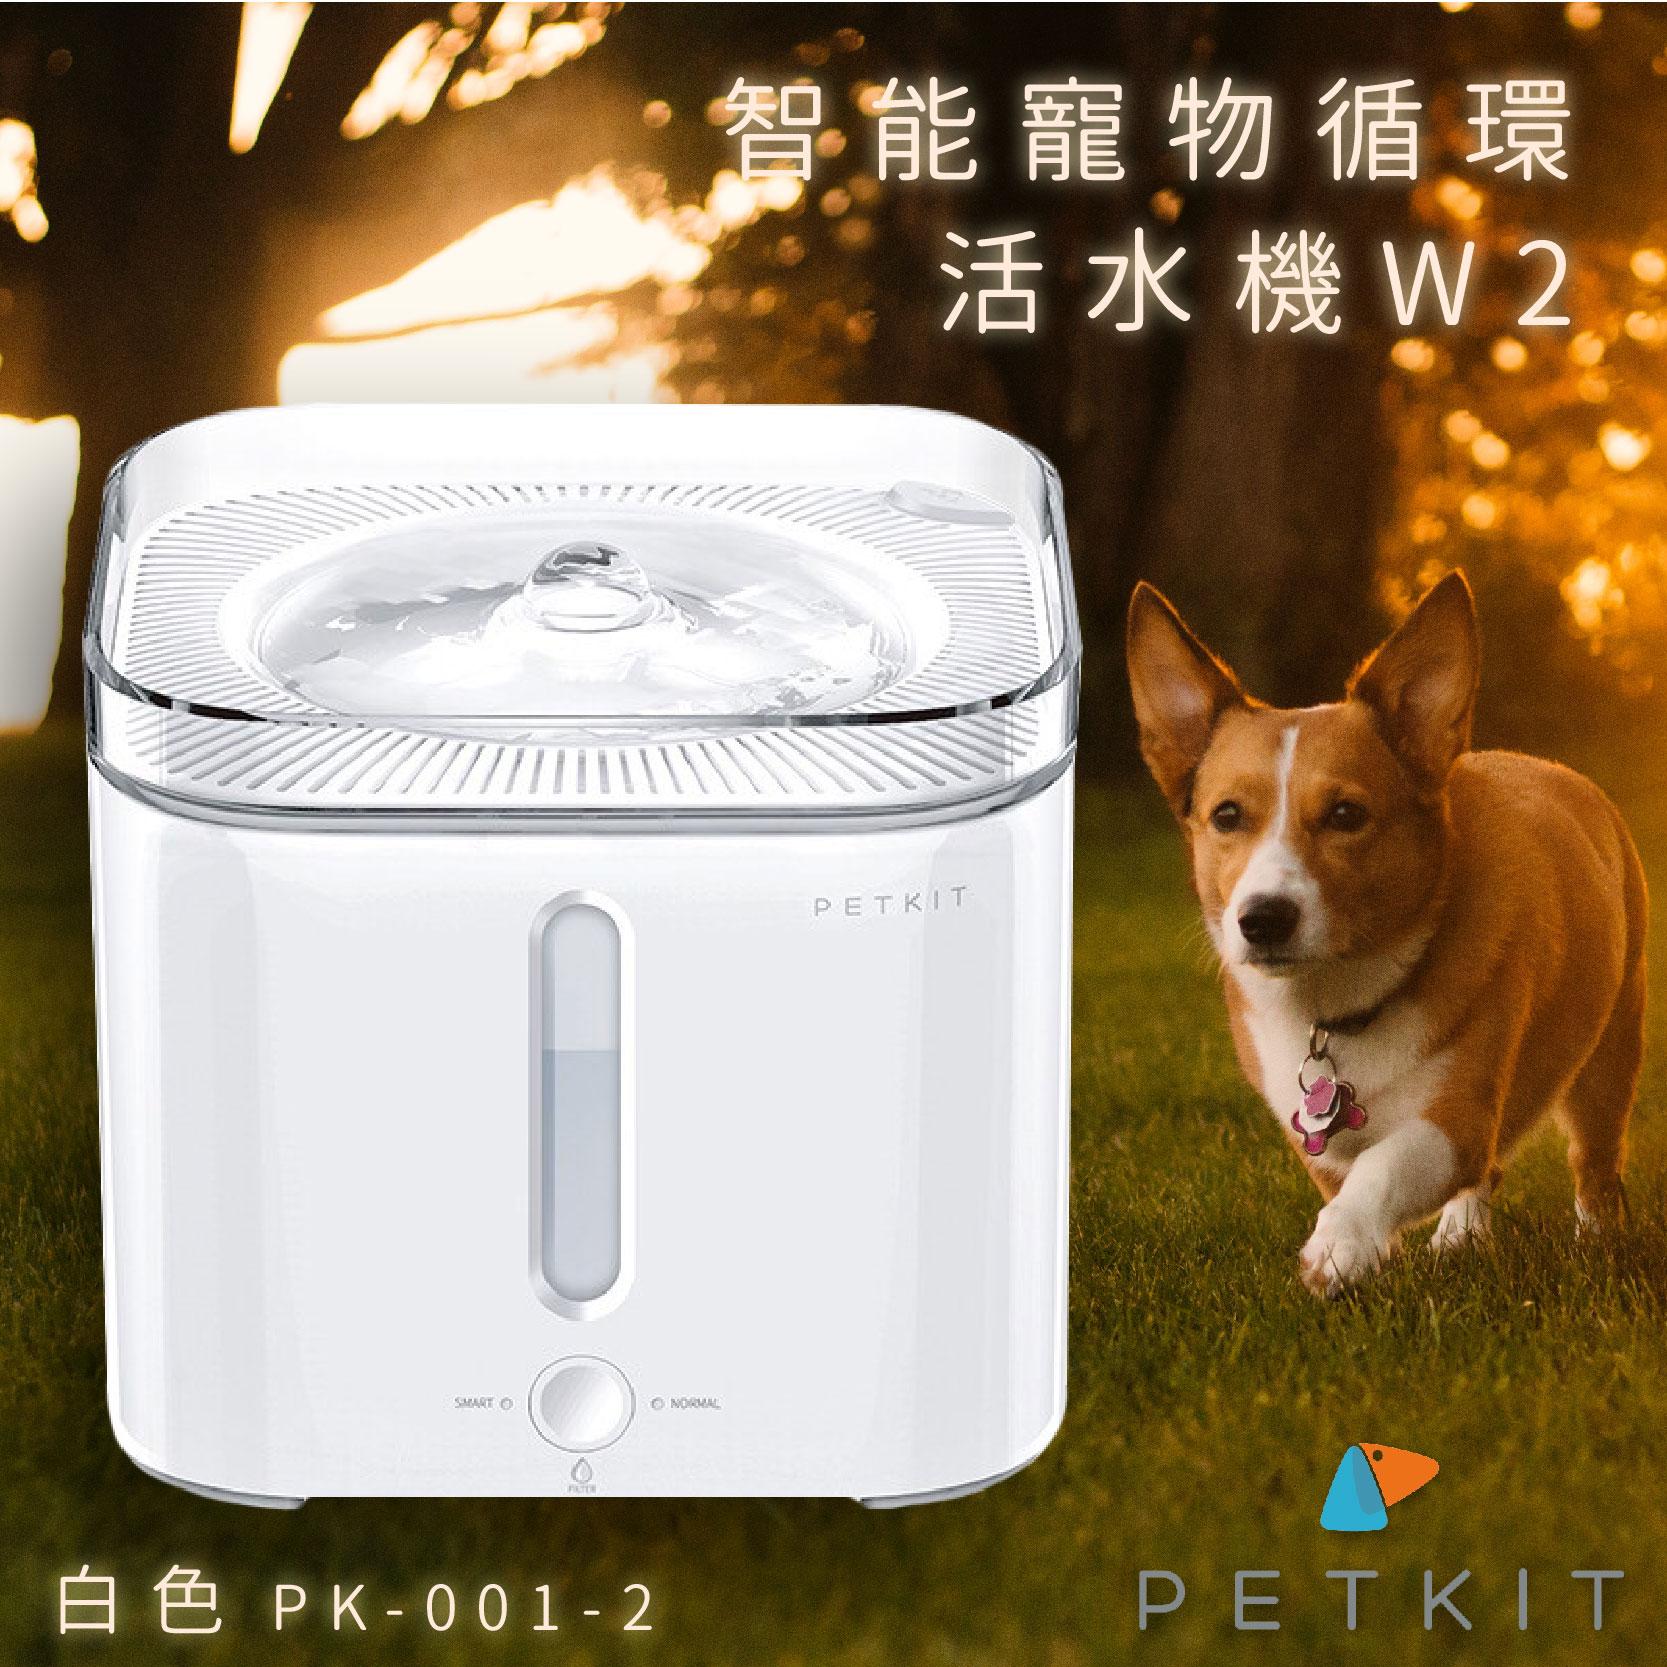 Petkit 智能寵物循環活水機W2 PK-001-2 白色 寵物飲水機 寵物用品 寵物餐飲 貓狗 過濾 循環水流